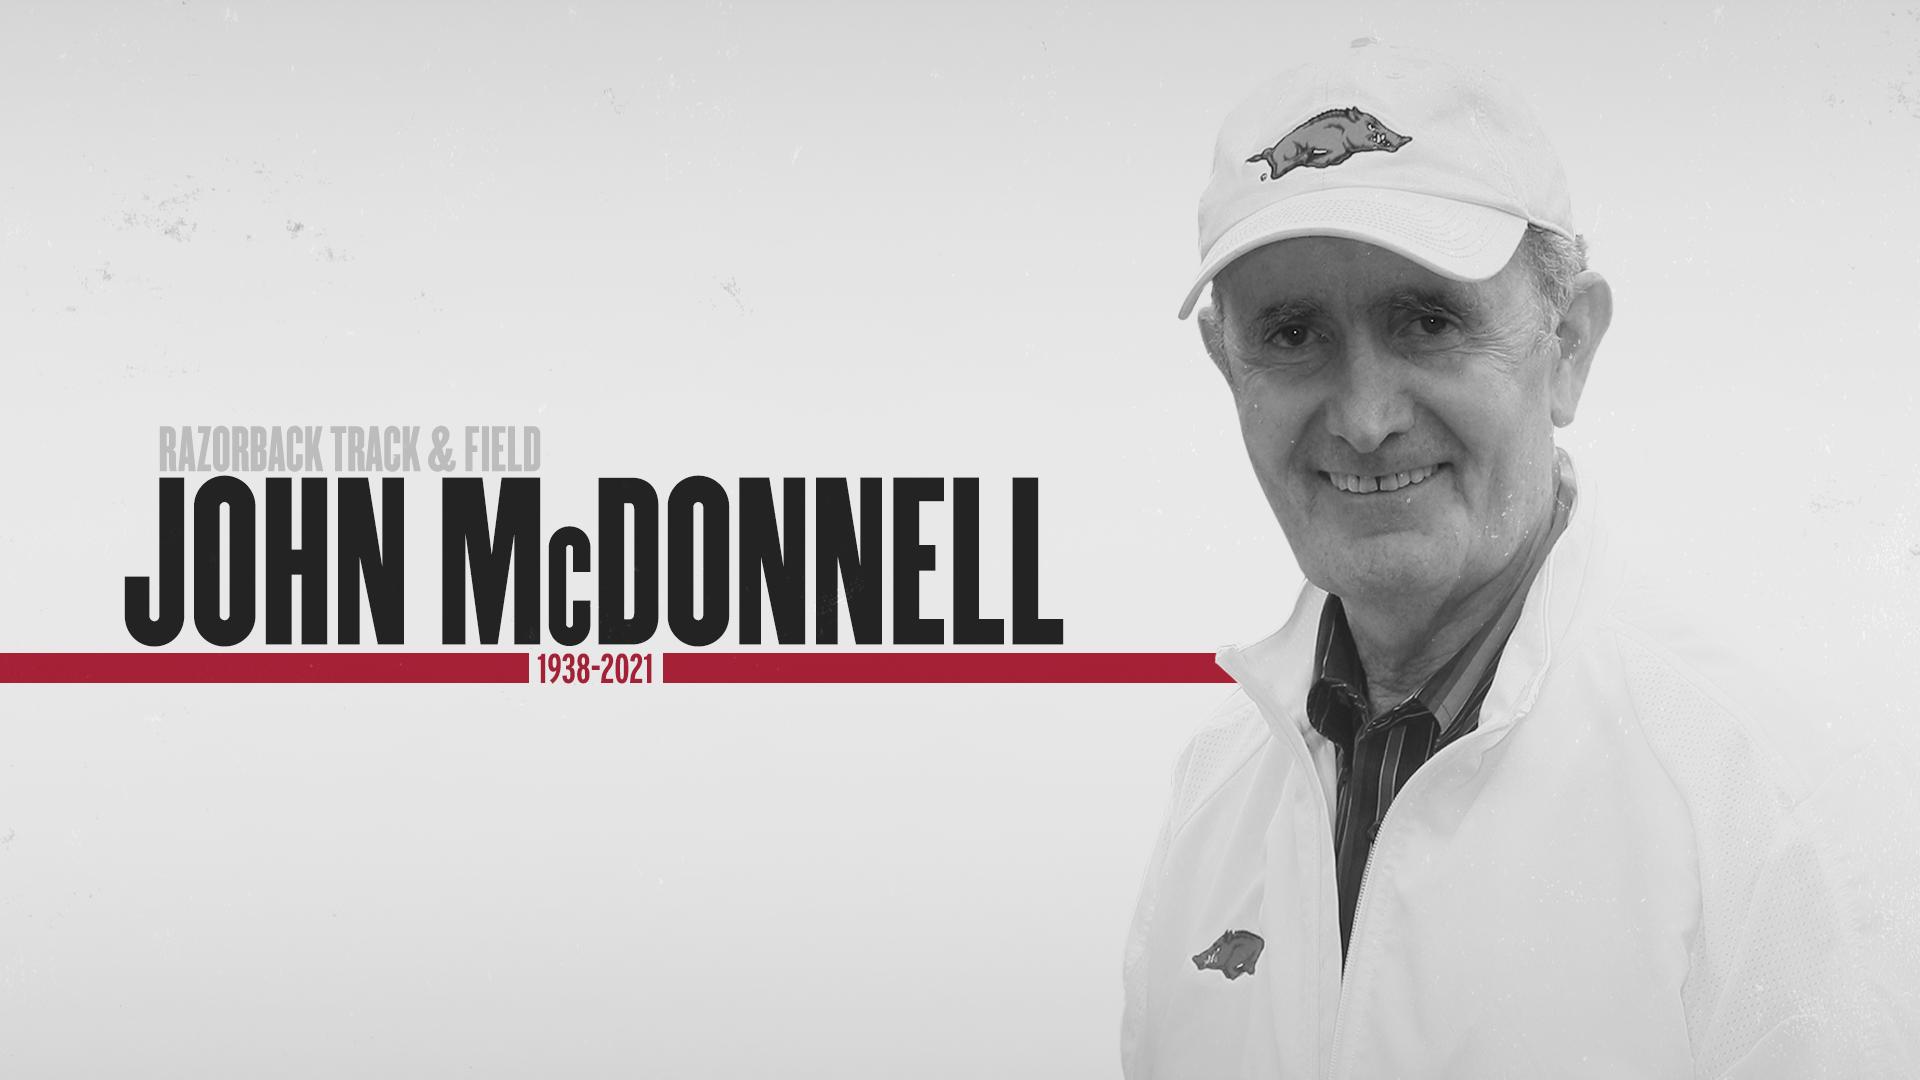 Legendary Arkansas Track & Field Coach John McDonnell Passes Away   Arkansas Razorbacks